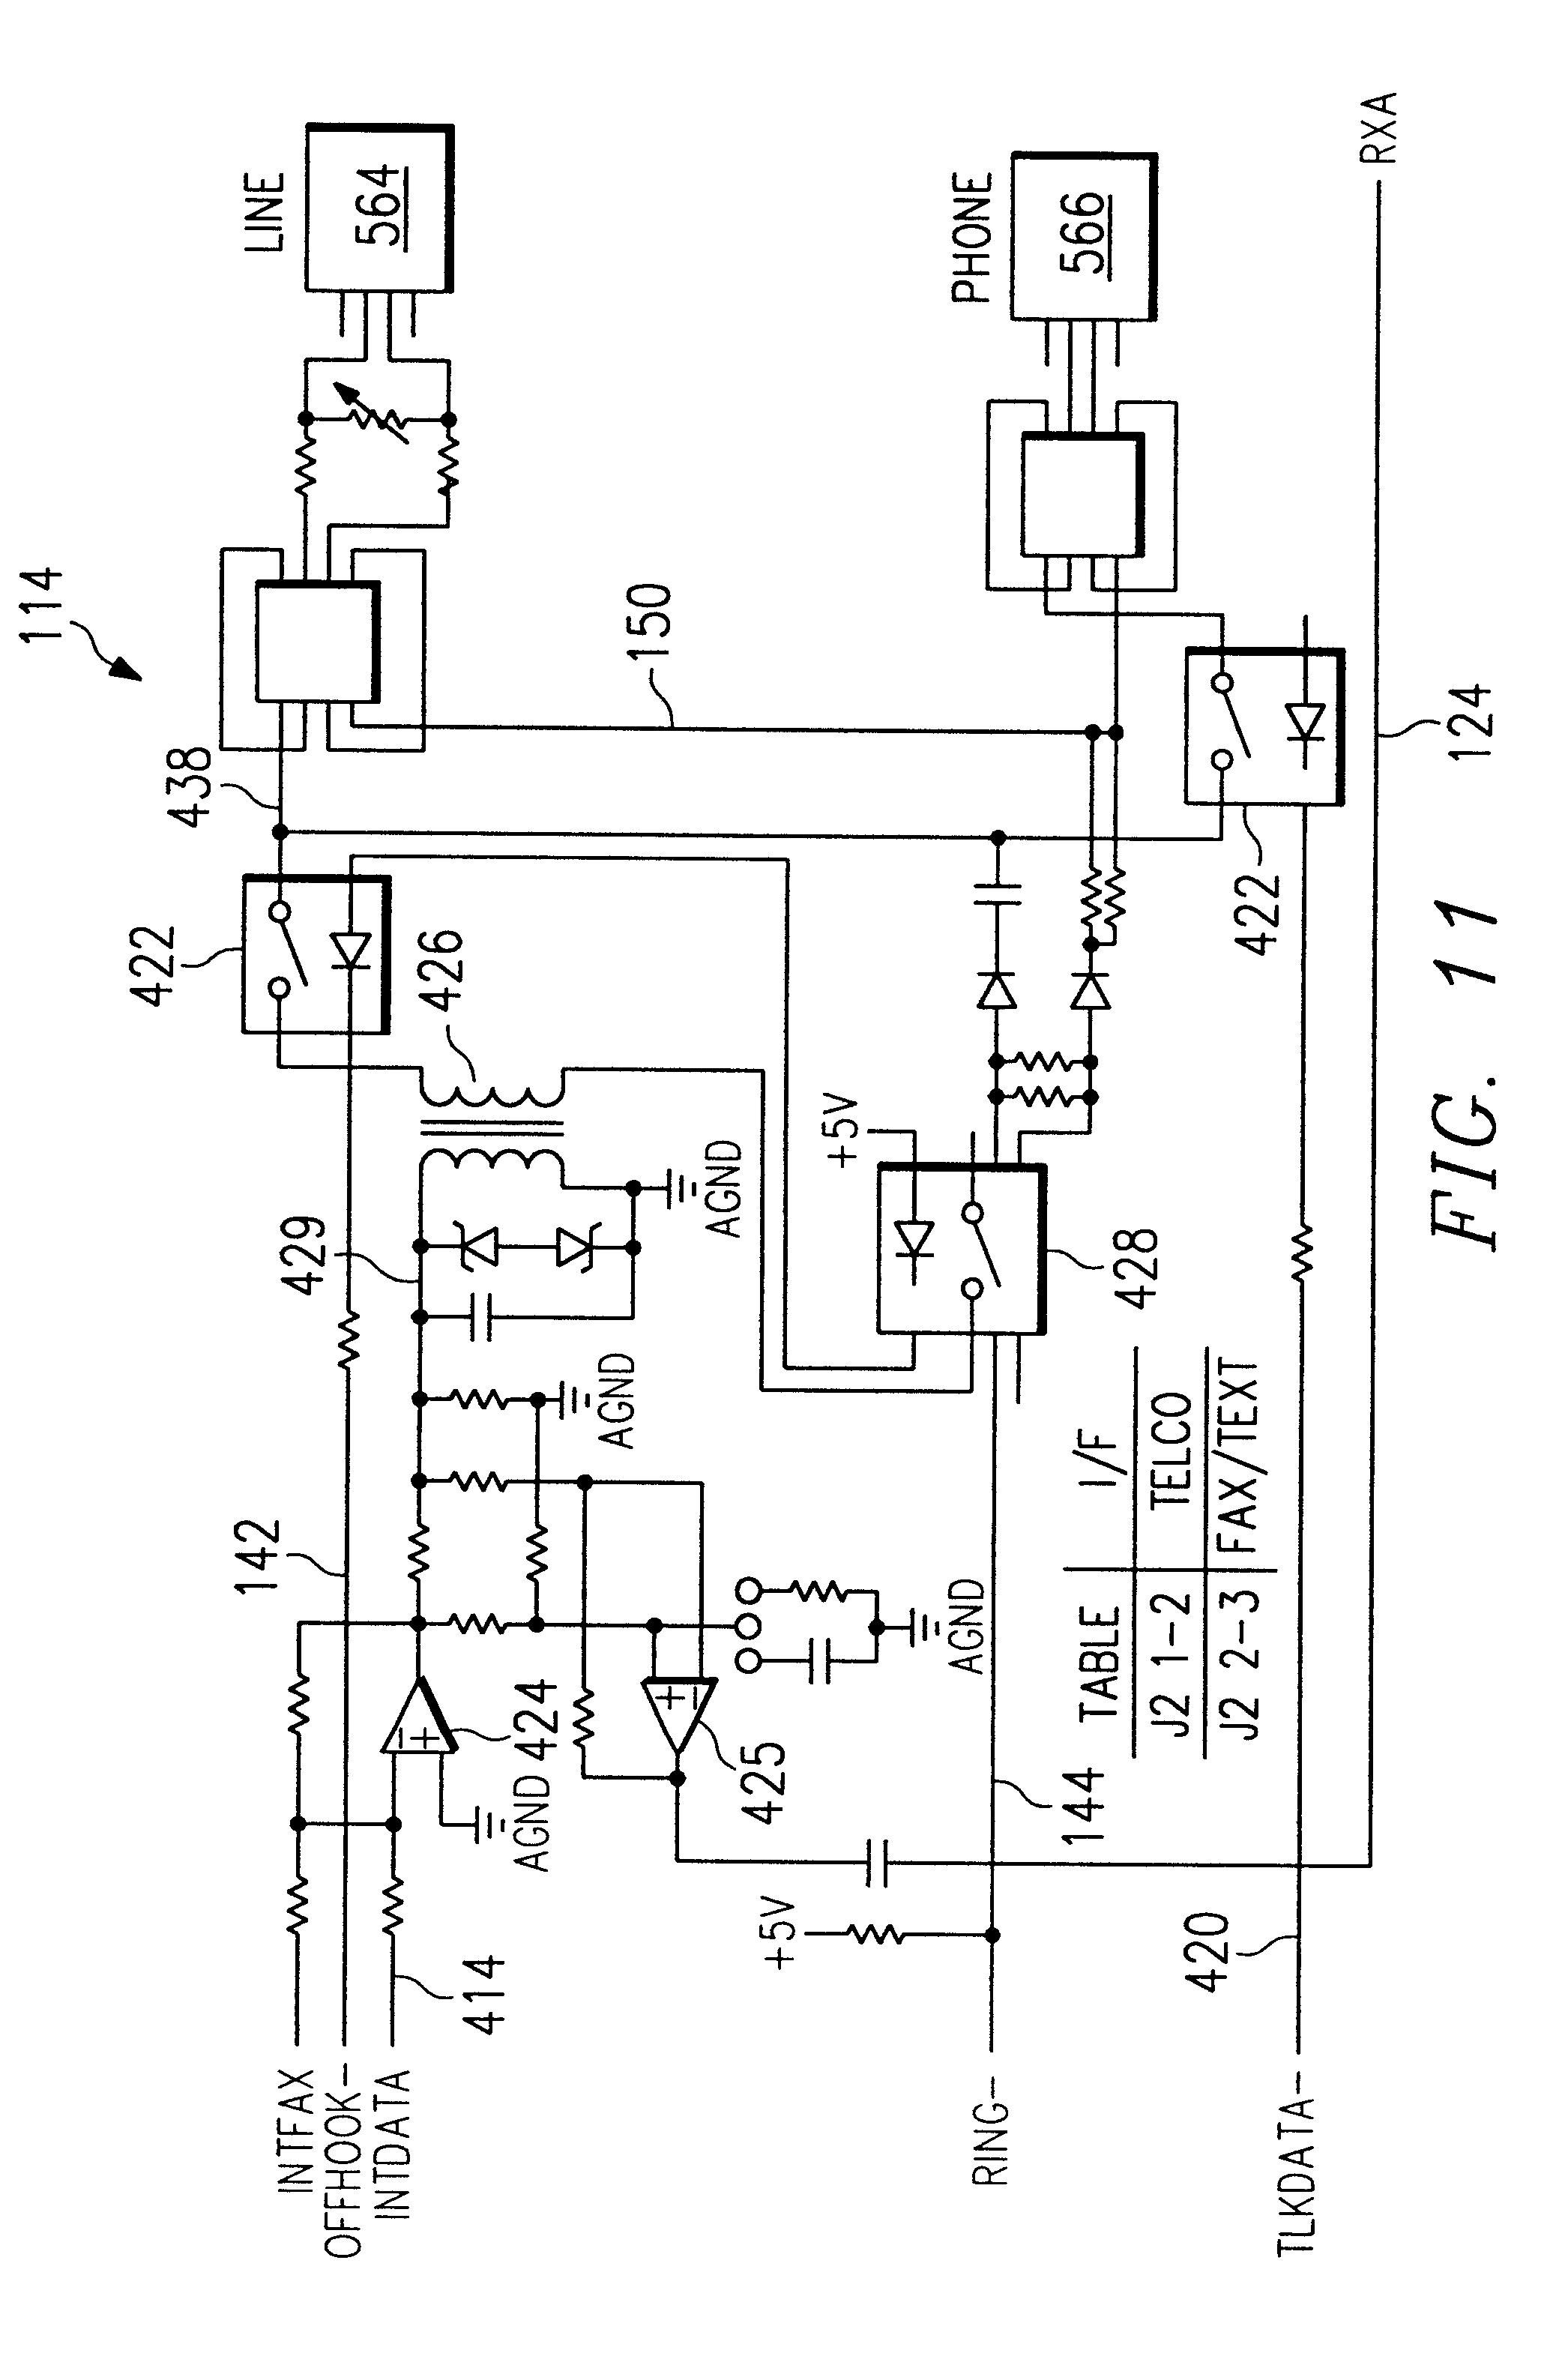 Patent Us6628340 Multipurpose Computerized Television Google Patents Walbro Carburetor Parts Diagram Drawing